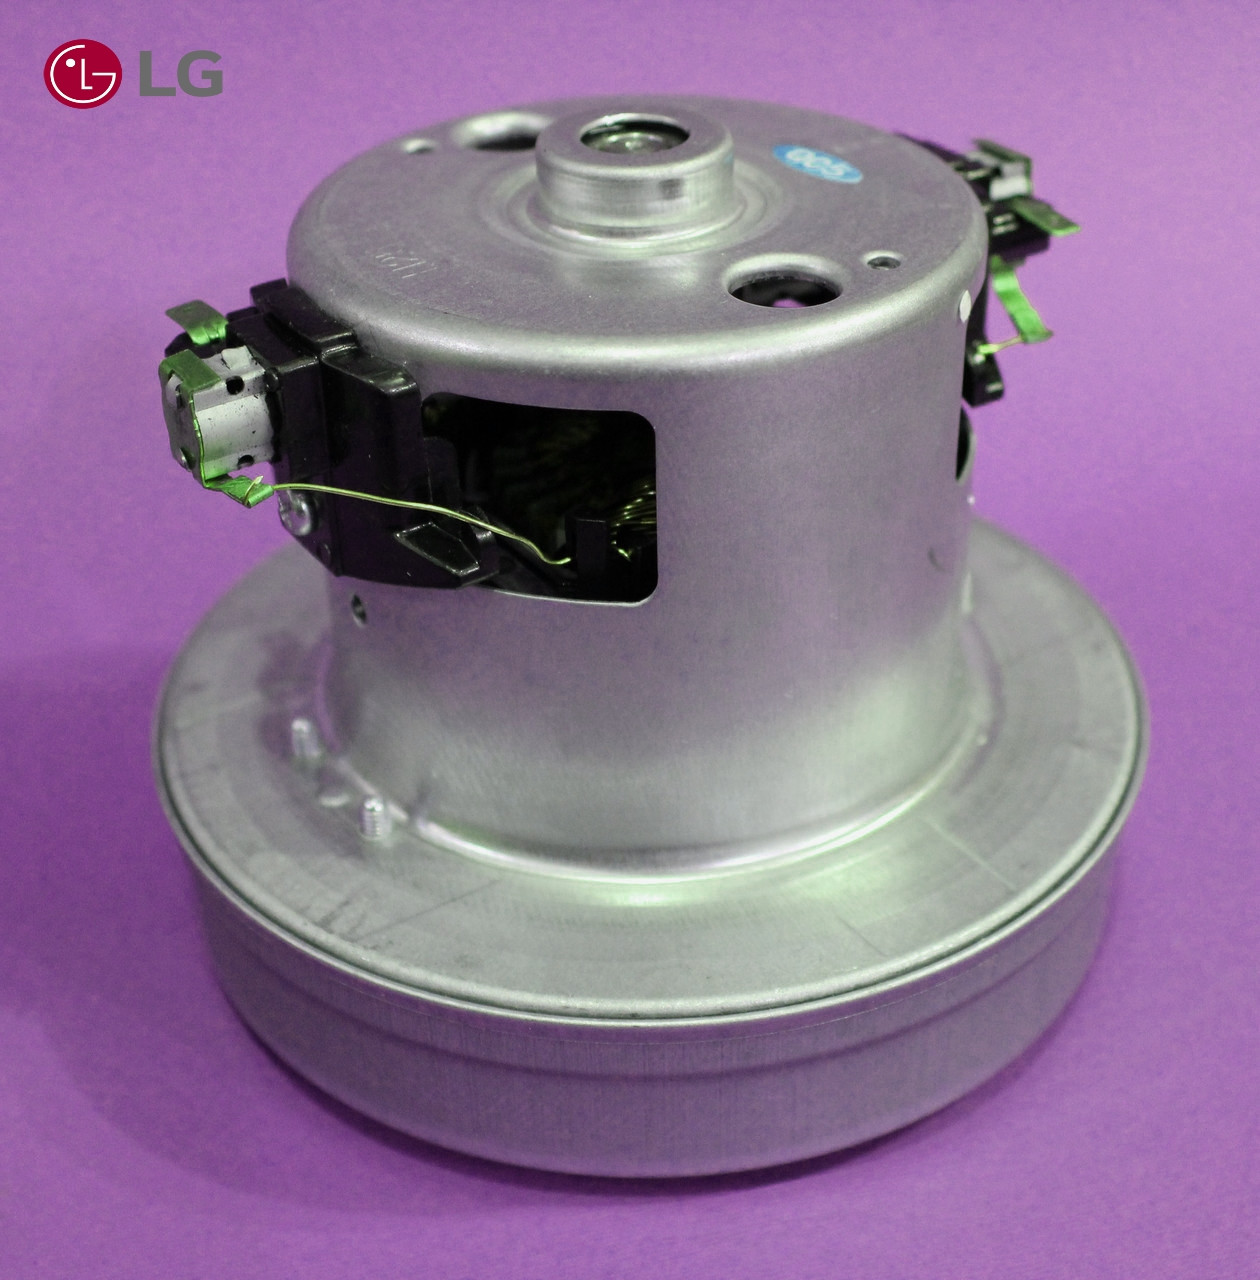 Двигатель для пылесоса LG V1J-PH27 1600W